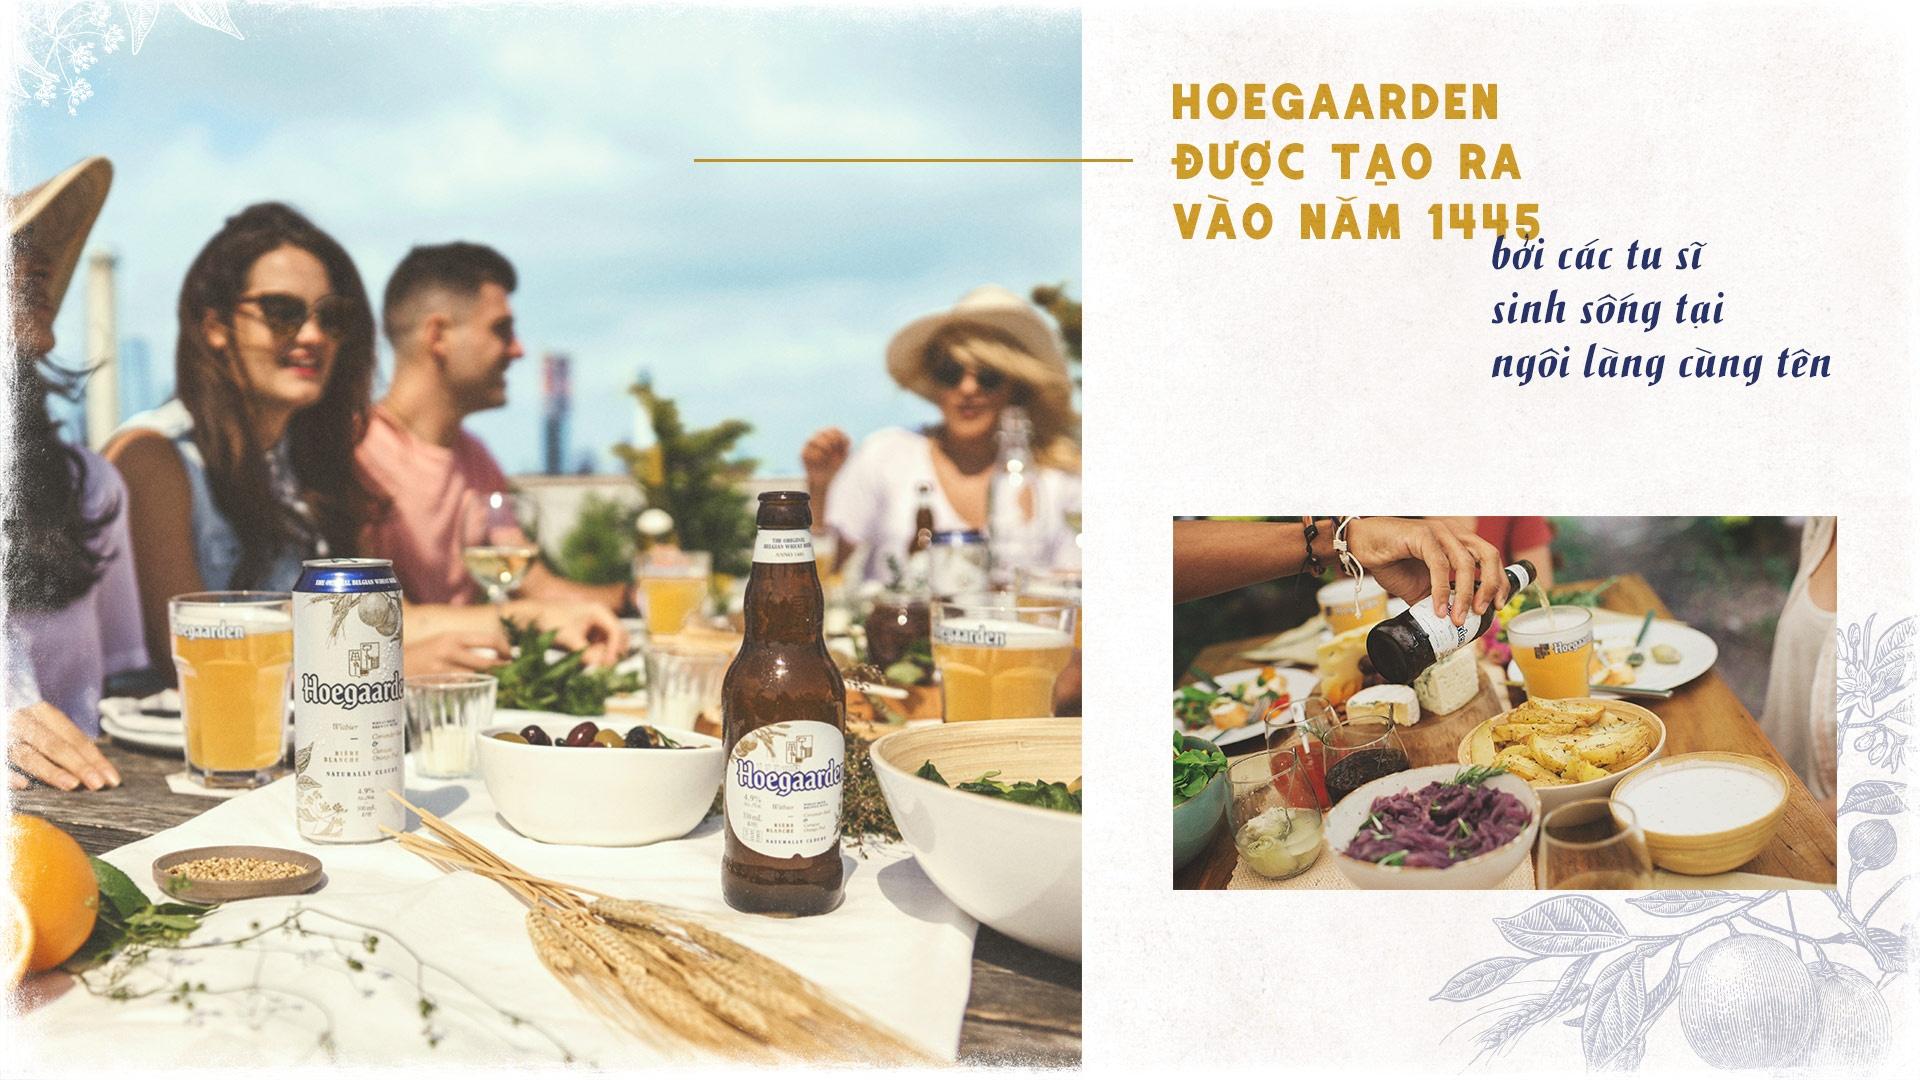 Hoegaarden - tinh hoa bia Bi danh thuc moi giac quan hinh anh 5